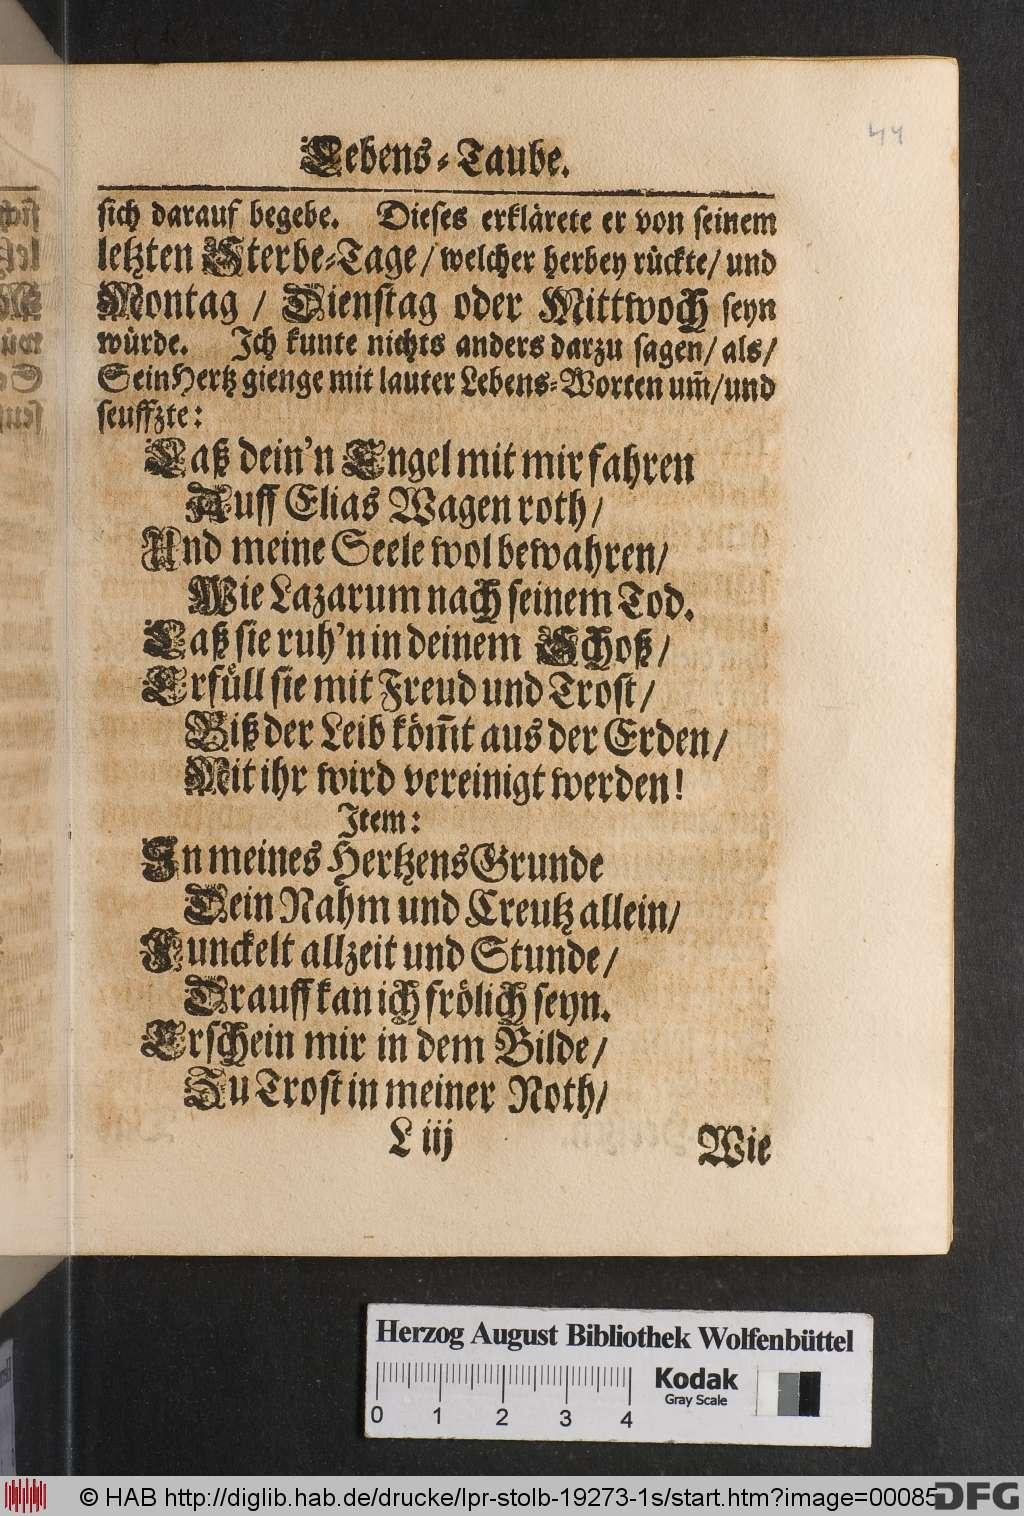 http://diglib.hab.de/drucke/lpr-stolb-19273-1s/00085.jpg